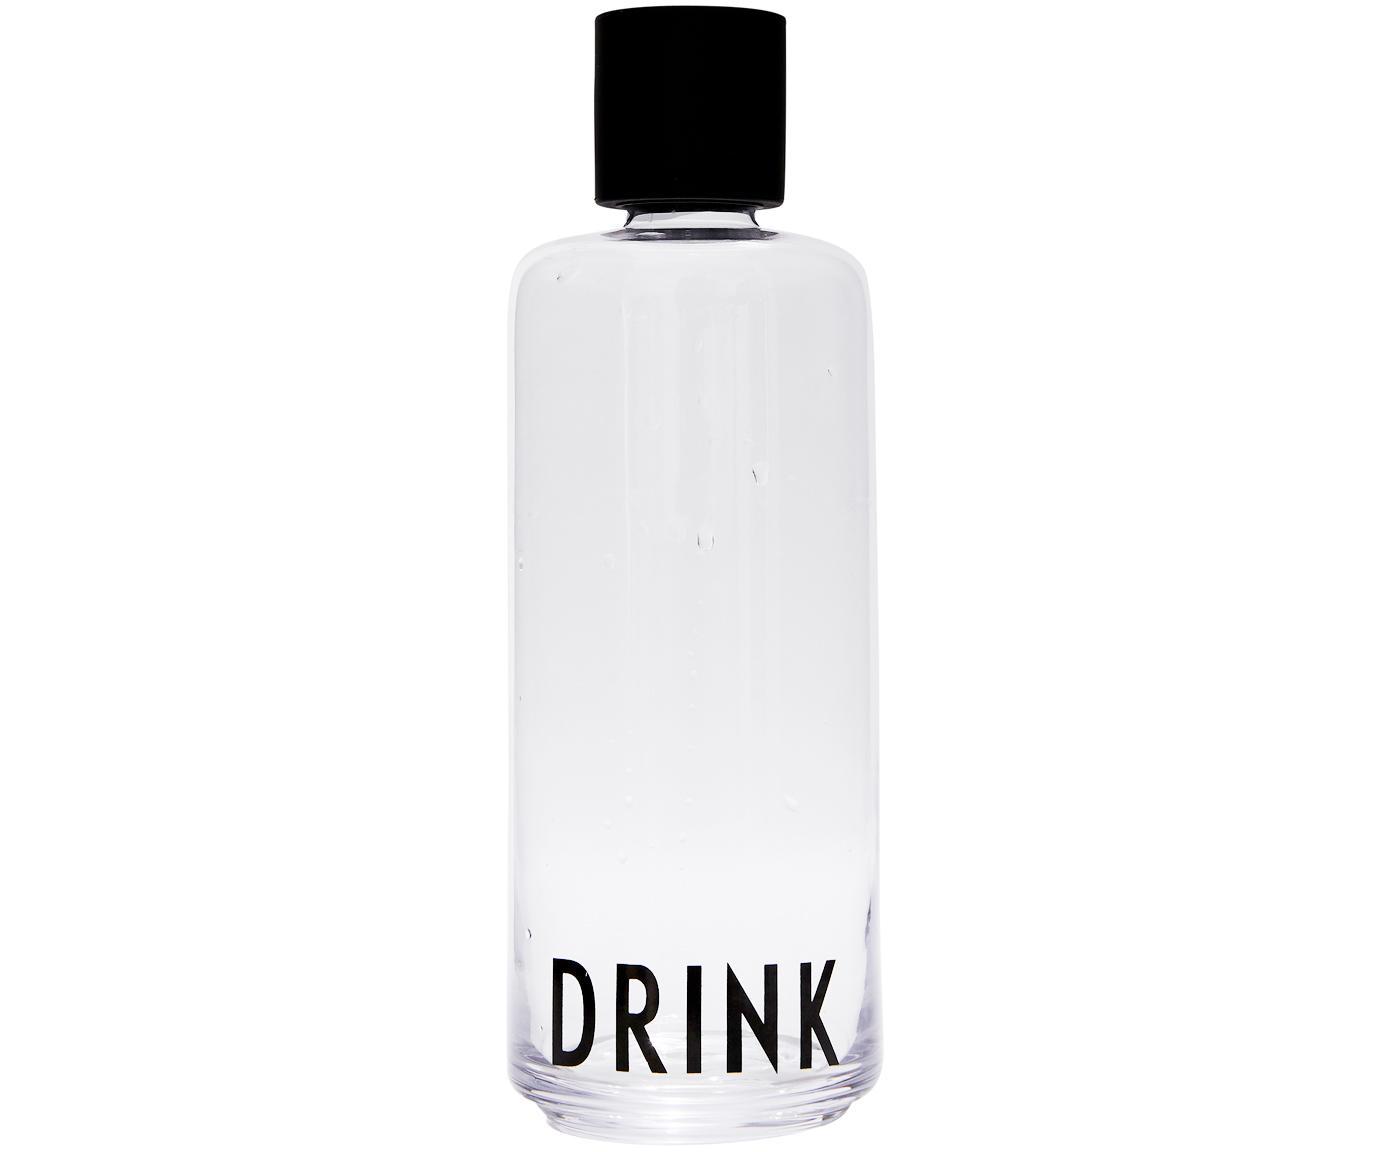 Design Karaffe Daily Drink mit Schriftzug, Verschluss: Silikon, Transparent, 1 L